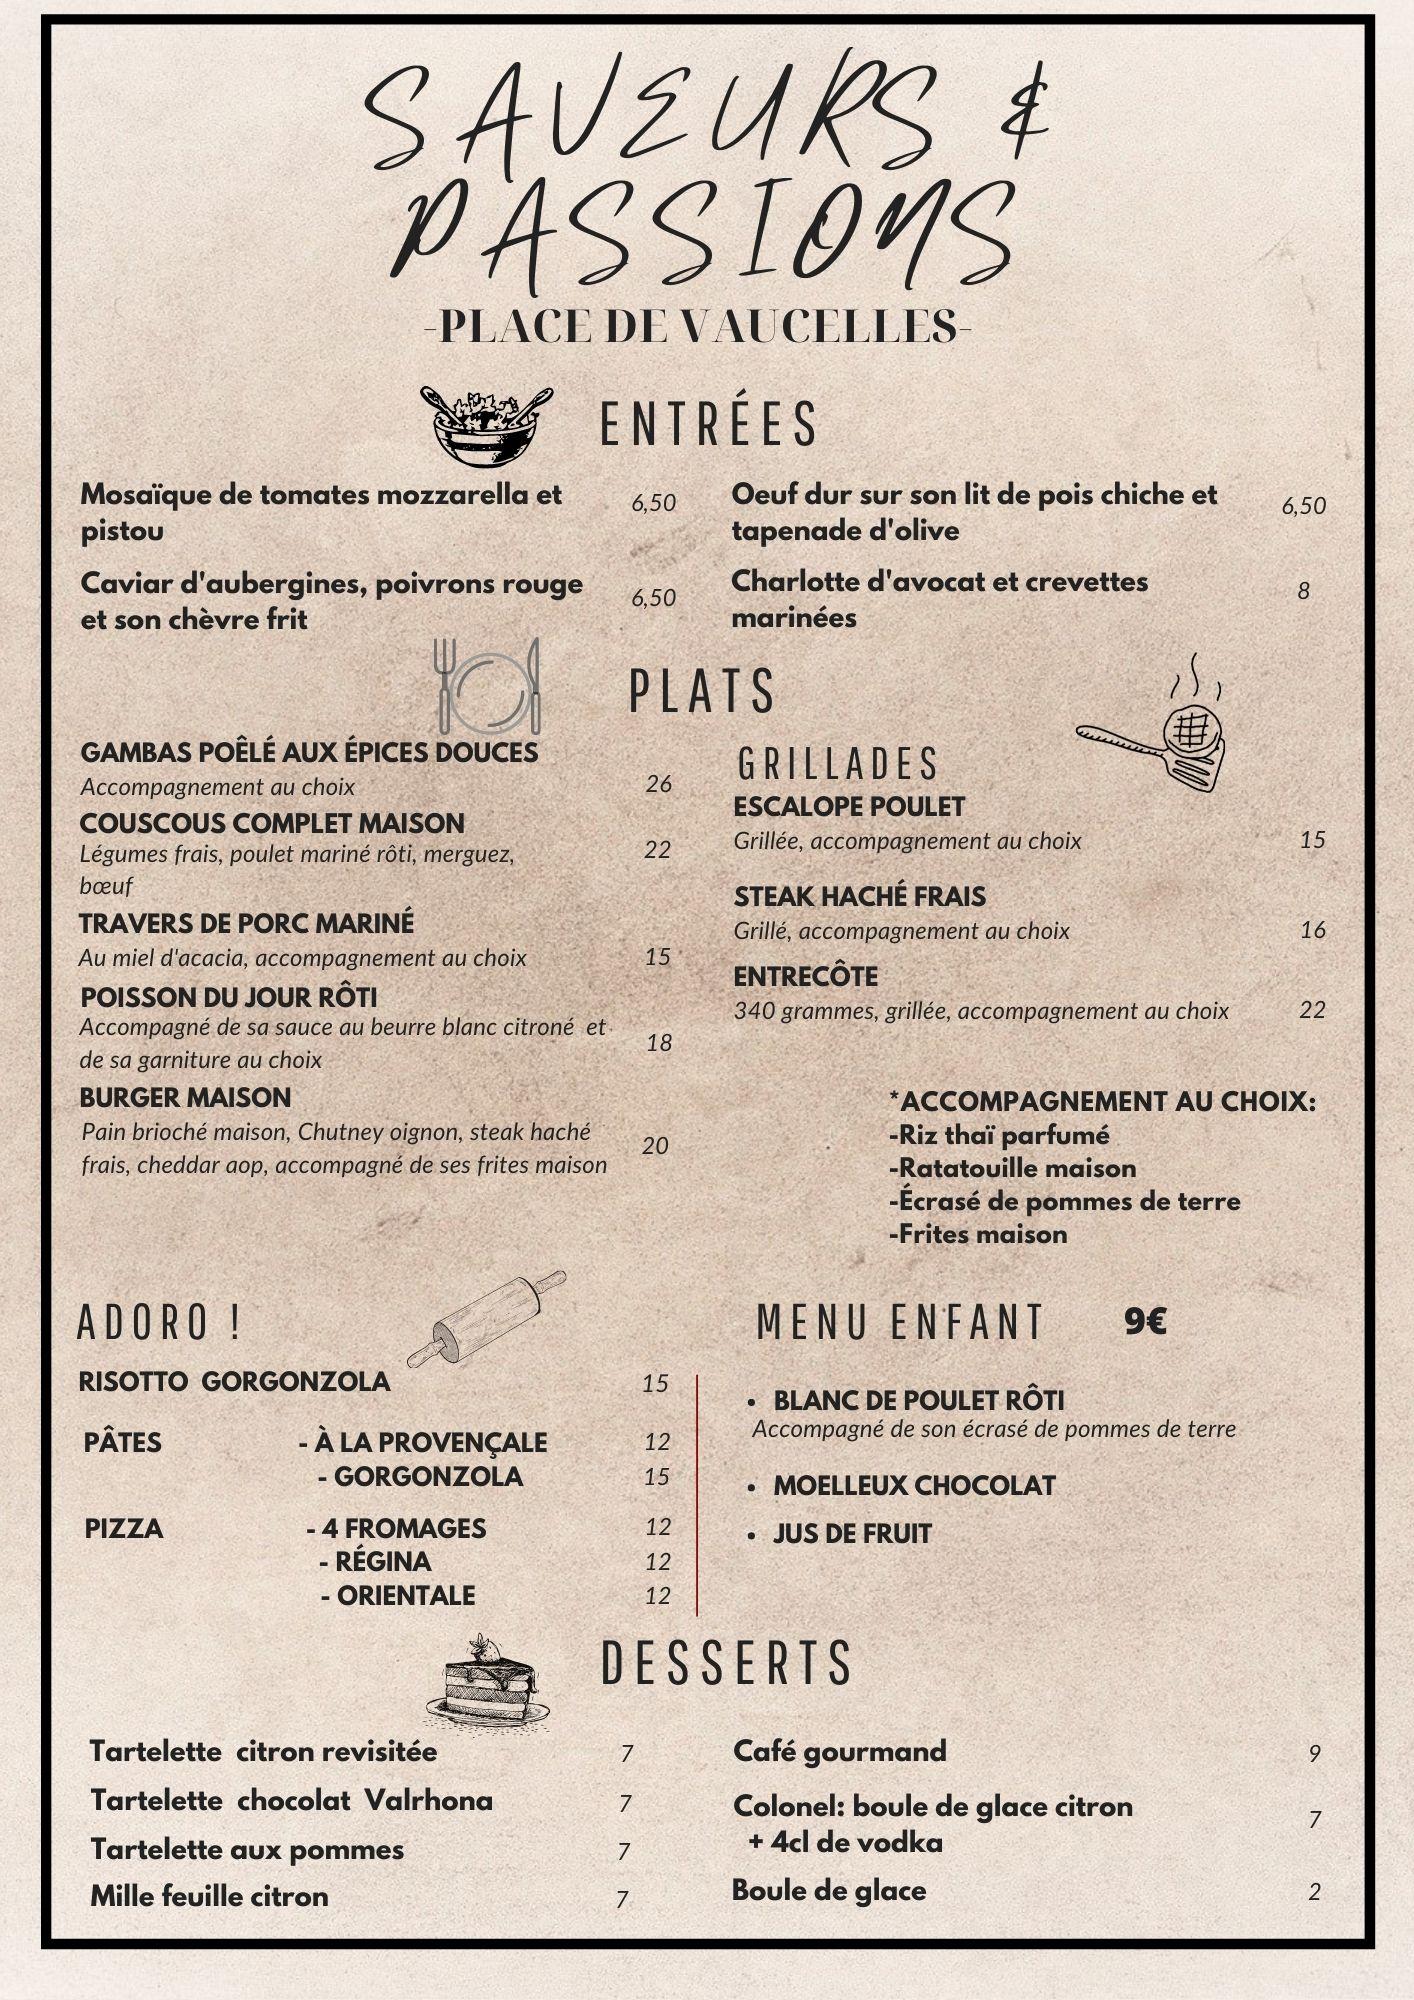 Saveurs passions restaurant taverny